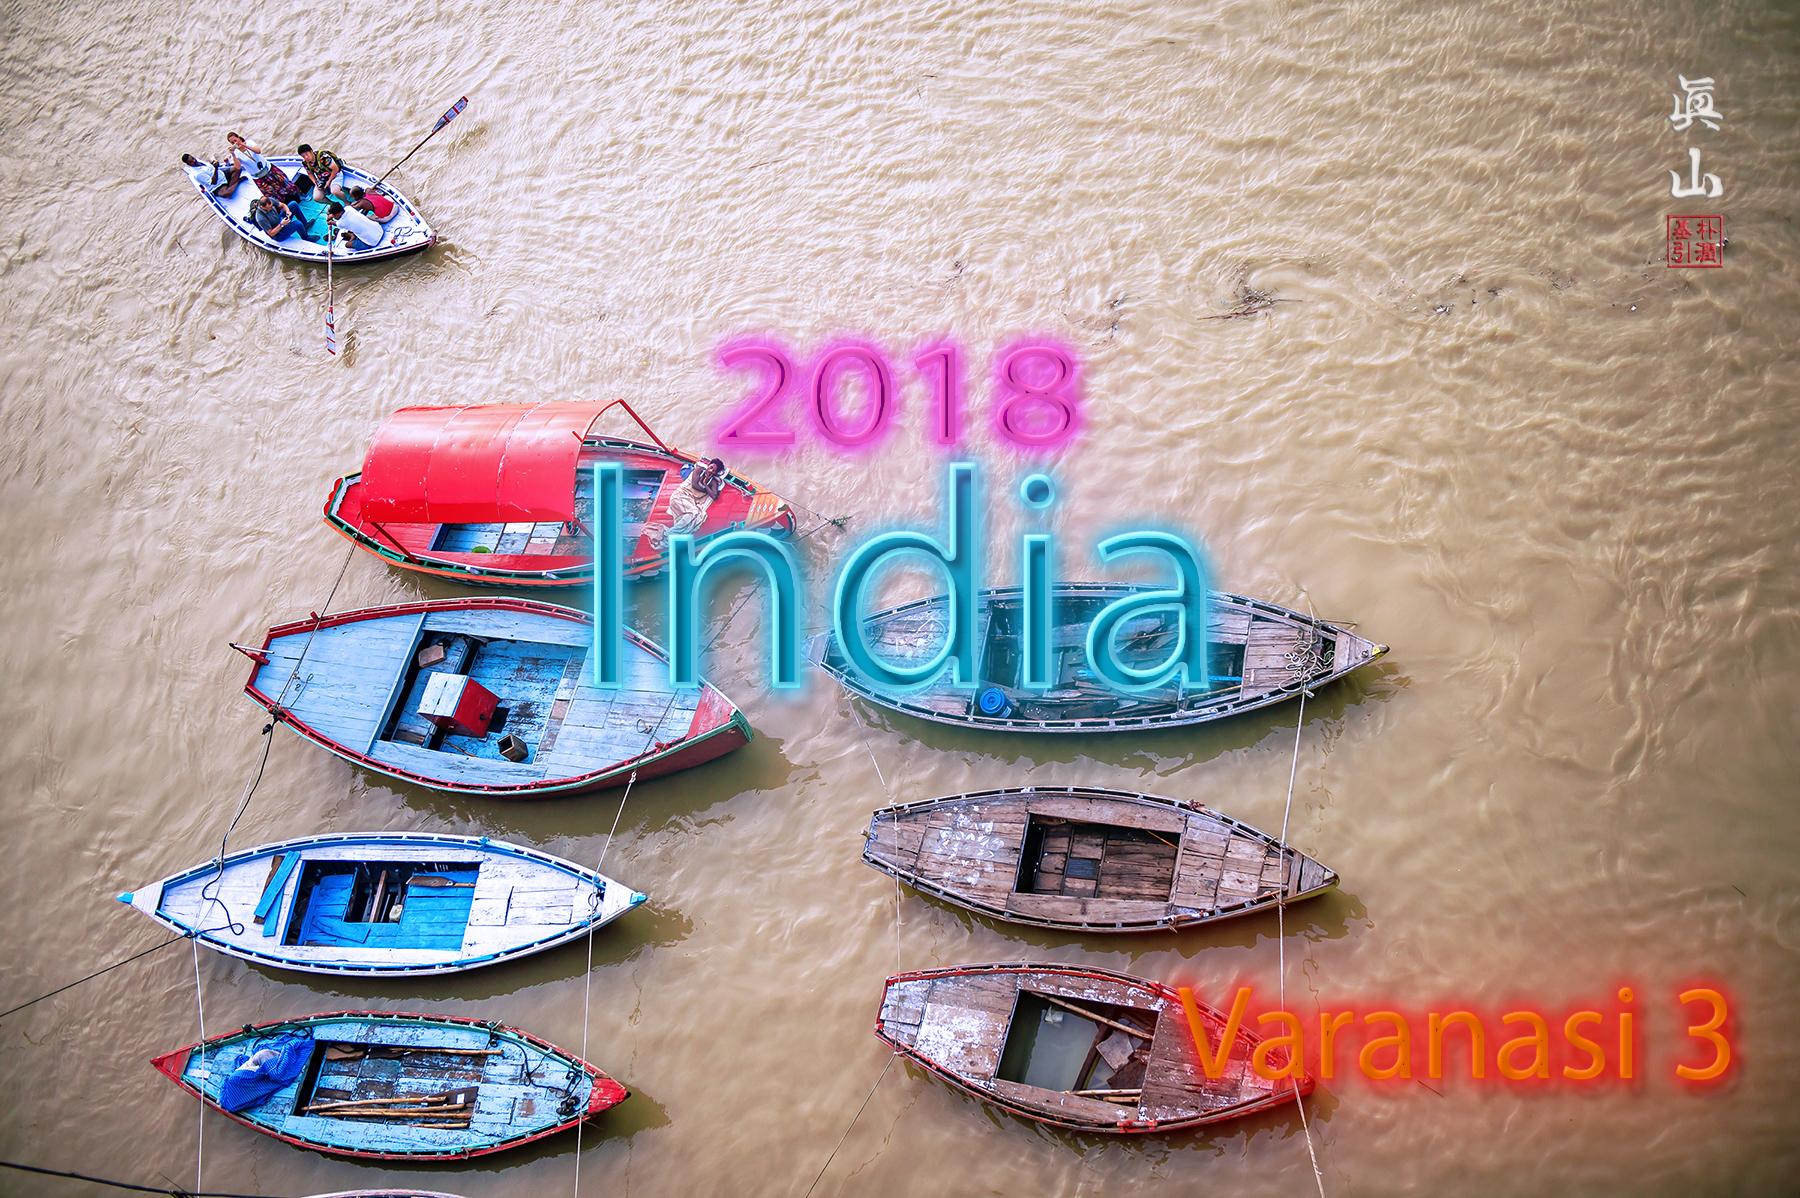 2018 India Tour - Varanasi 3, 4th day